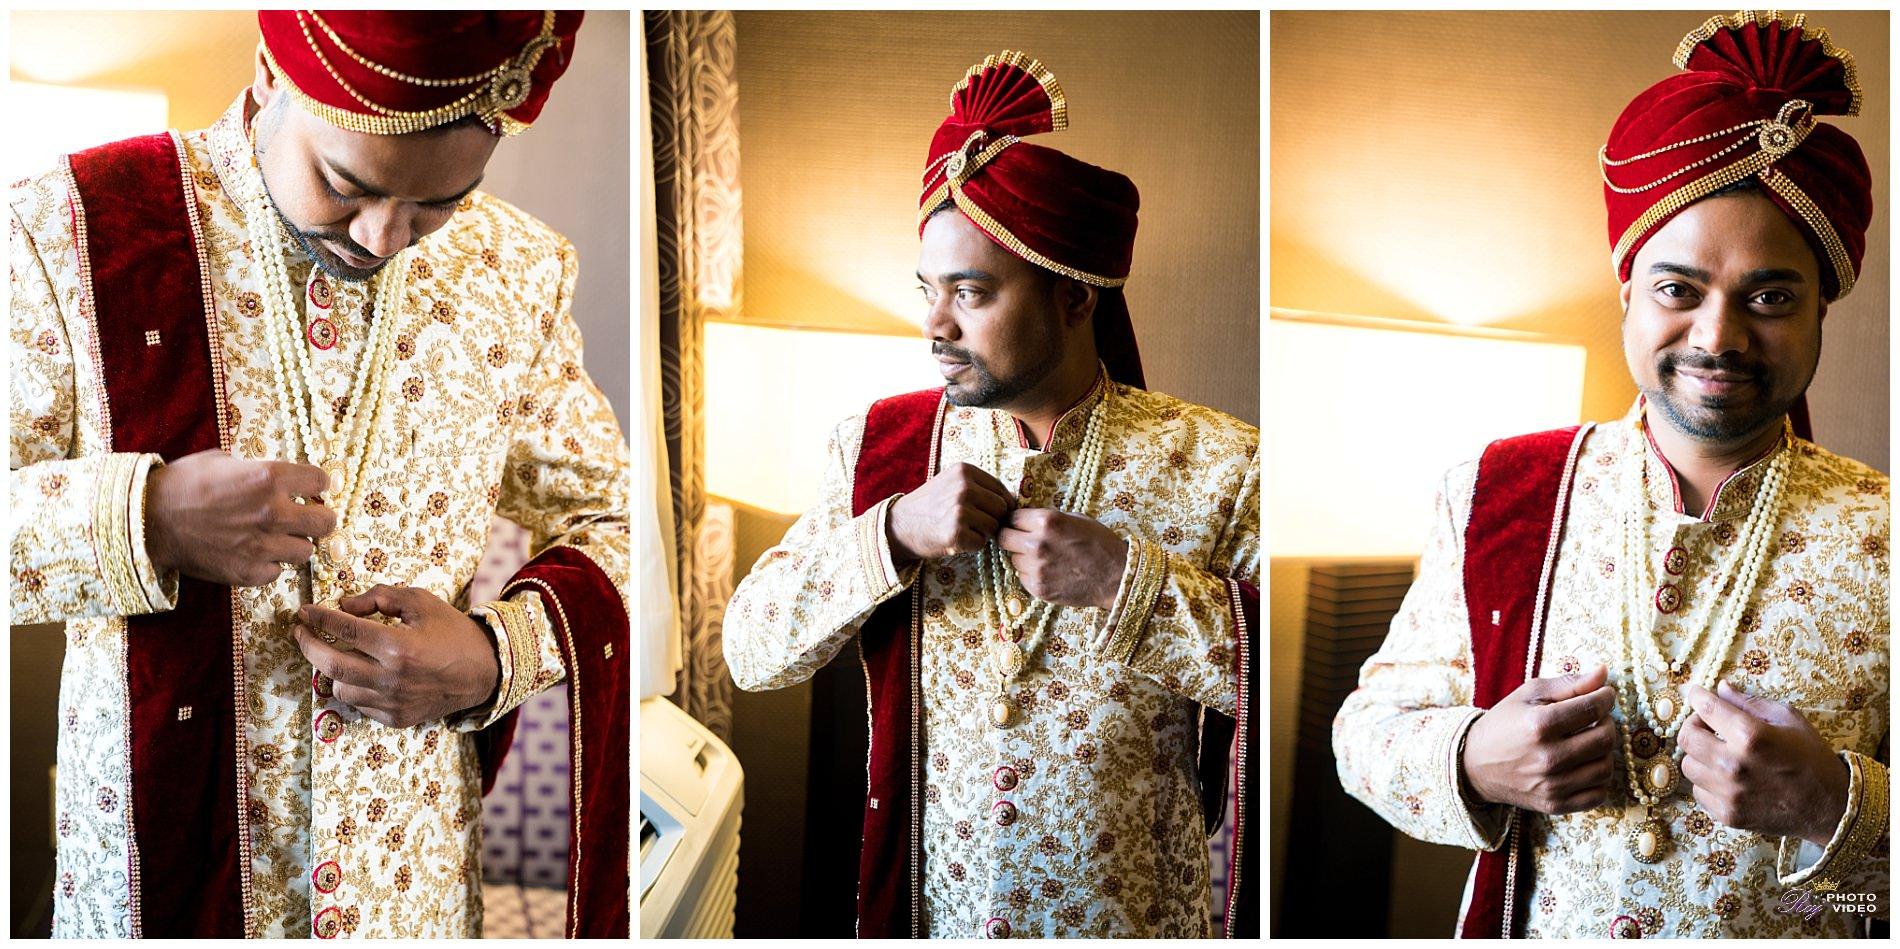 doubletree-by-hilton-hotel-wilmington-de-wedding-krishna-ritesh-24.jpg